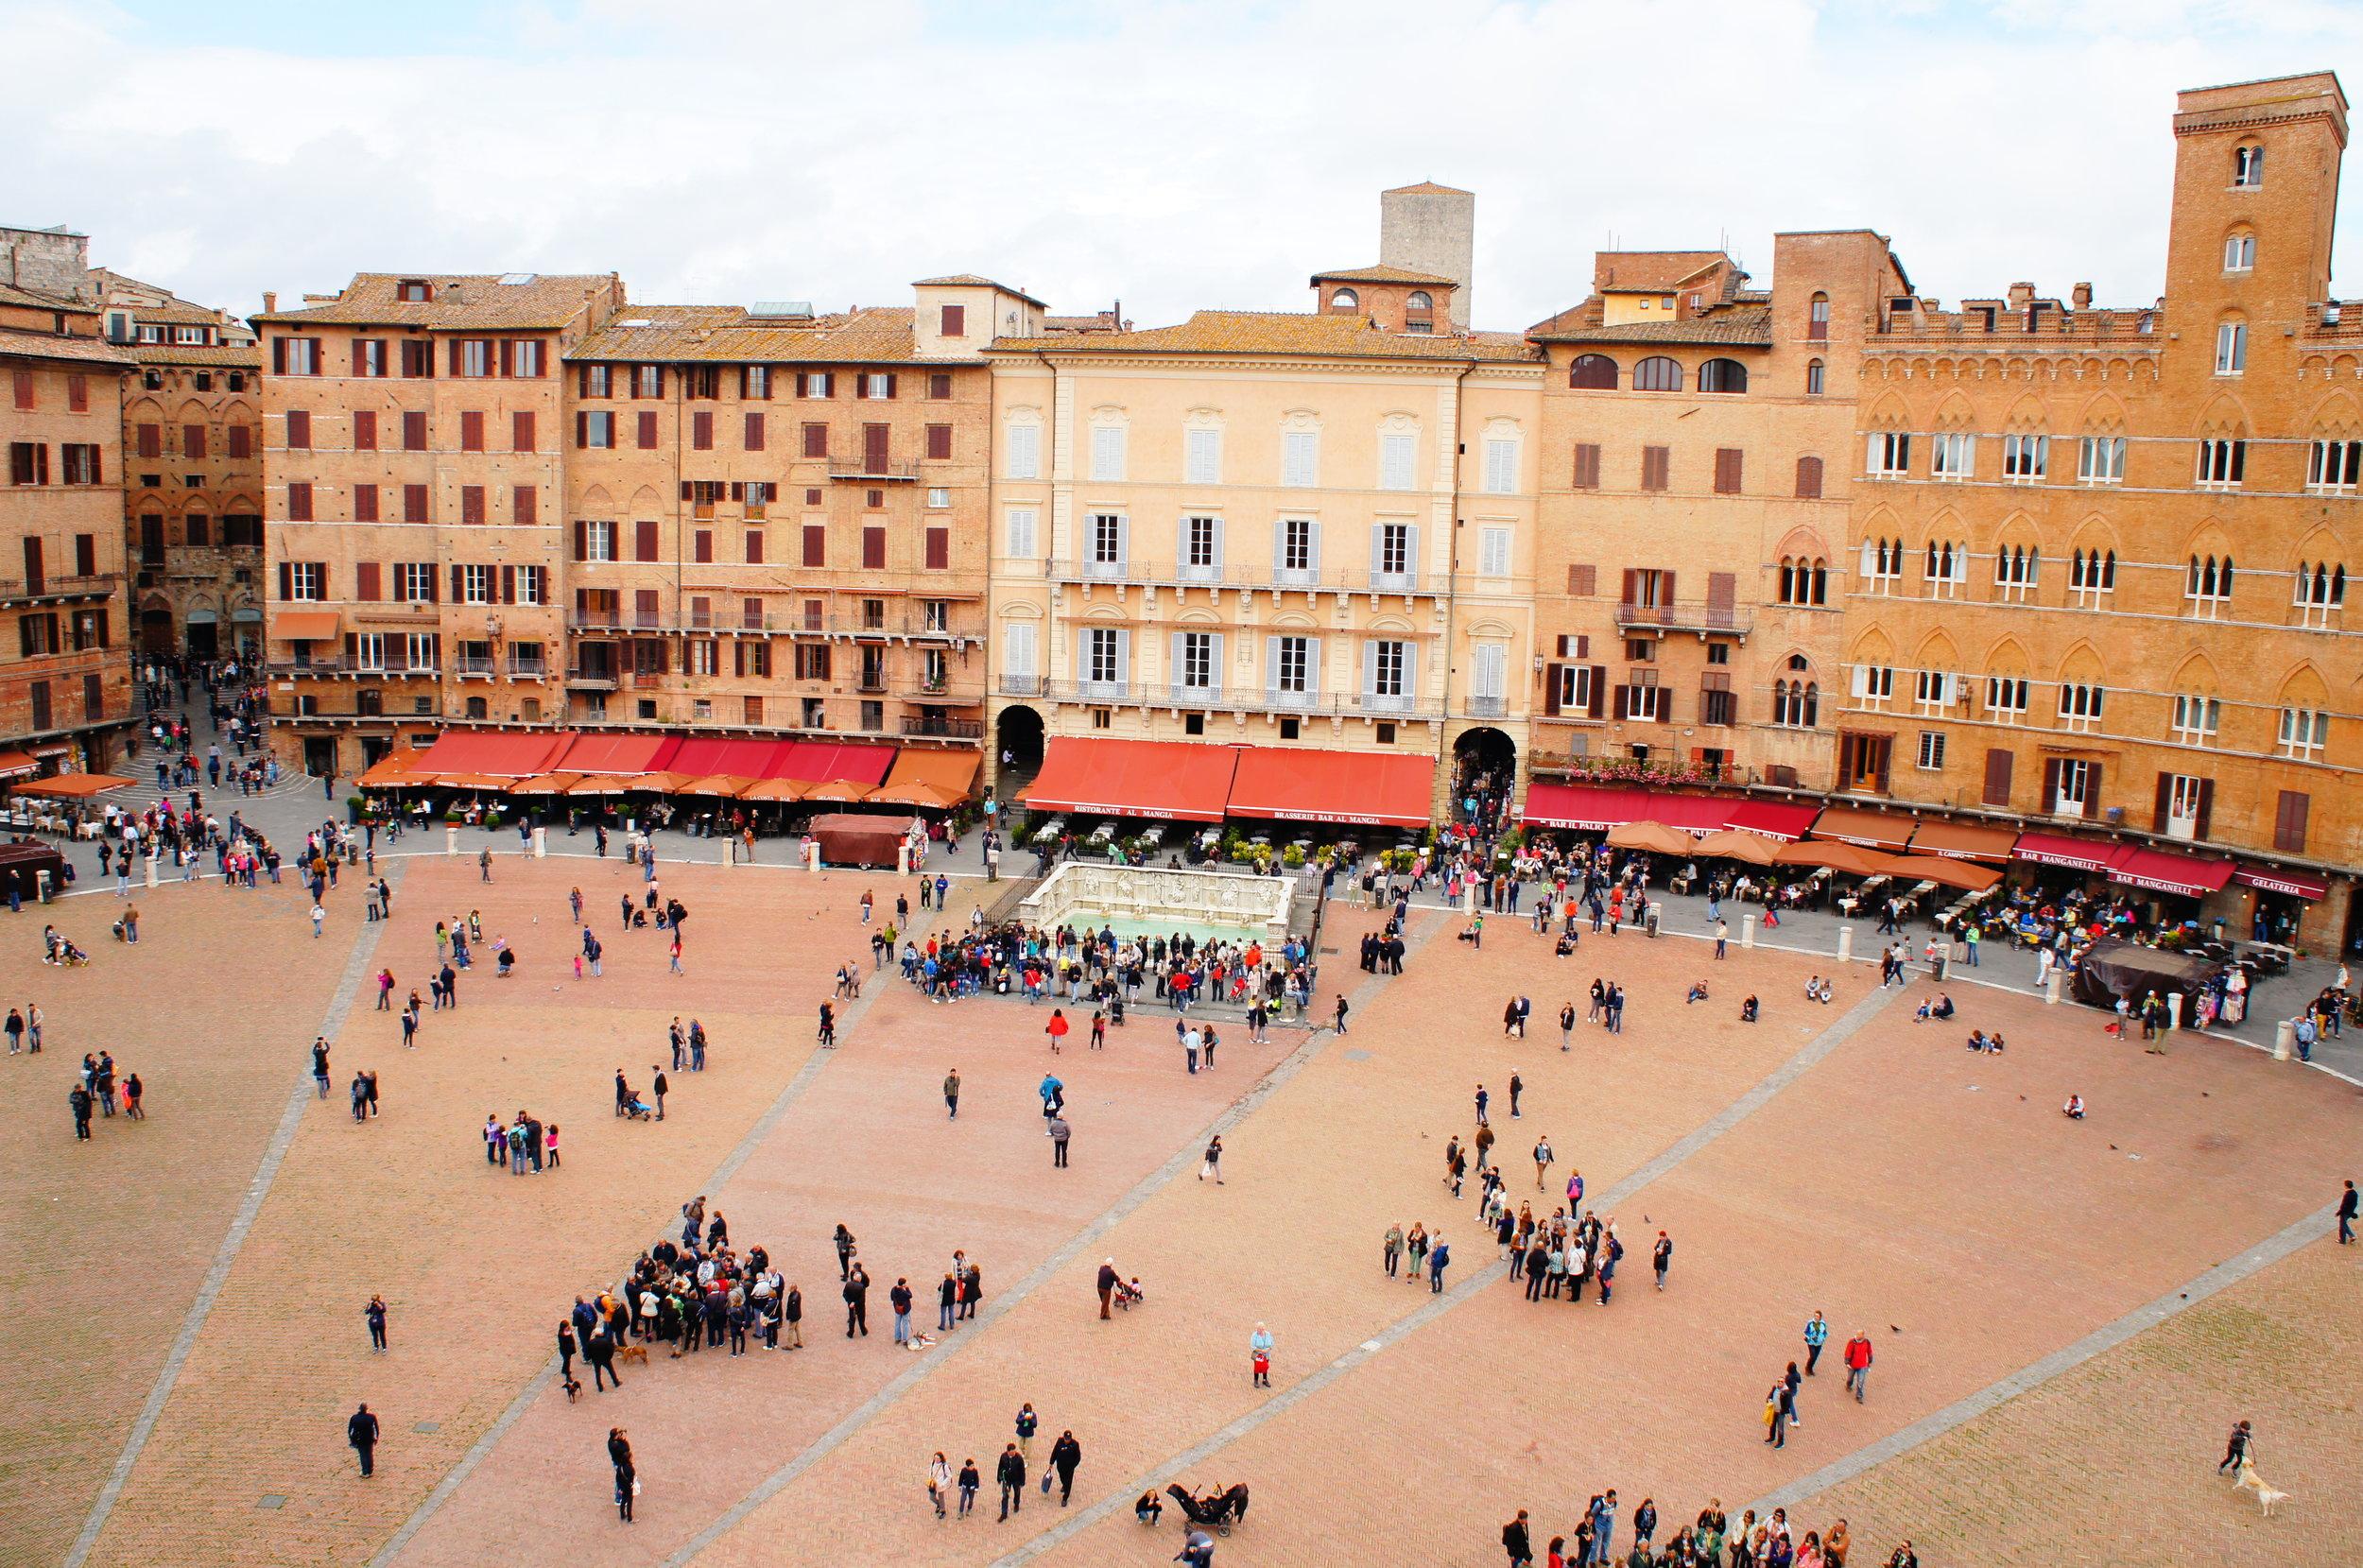 Piazza_del_Campo_(Siena)_06.jpeg